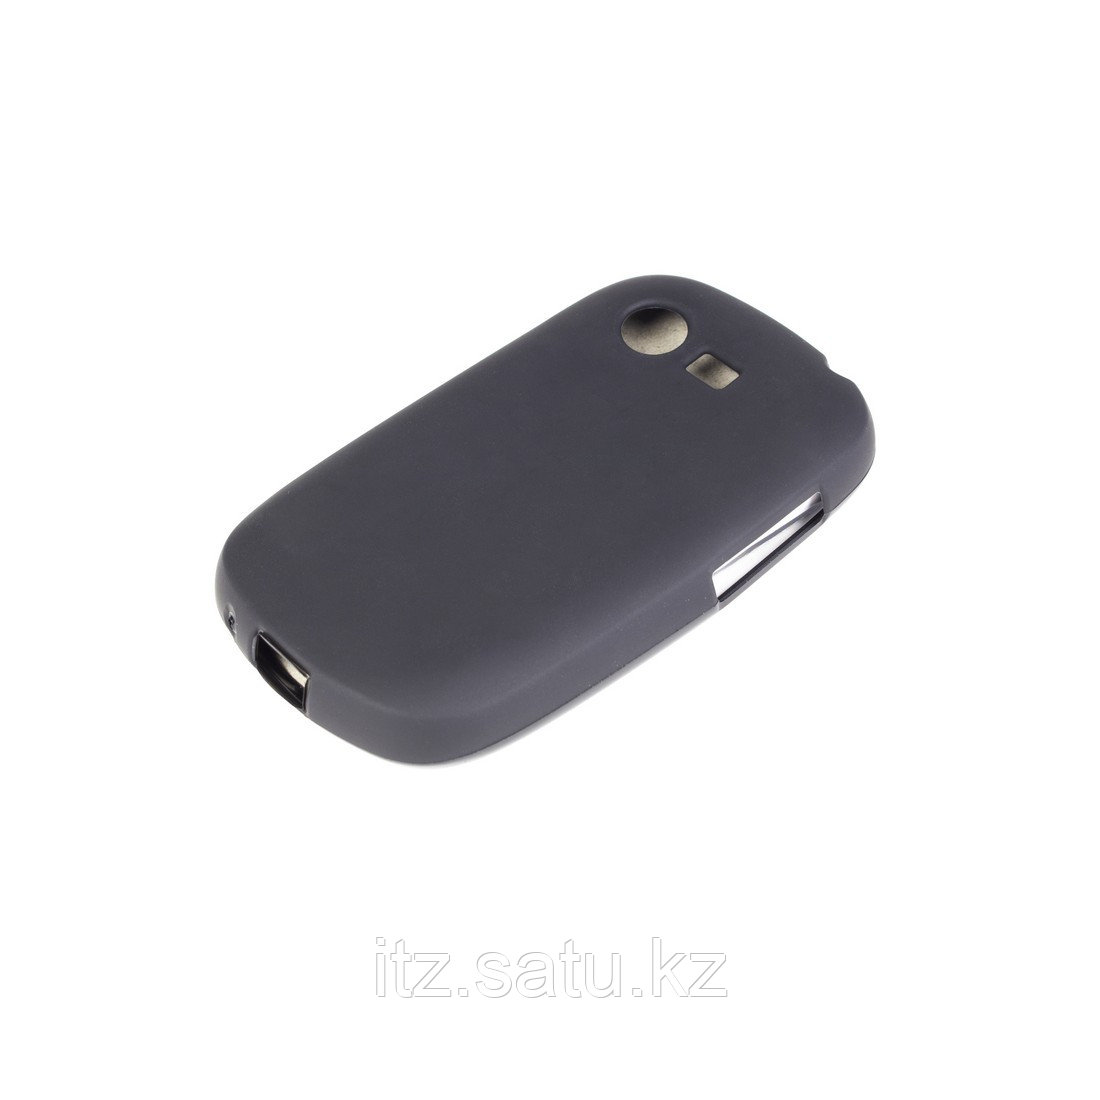 Чехол для телефона Samsung Galaxy Star(S5282)